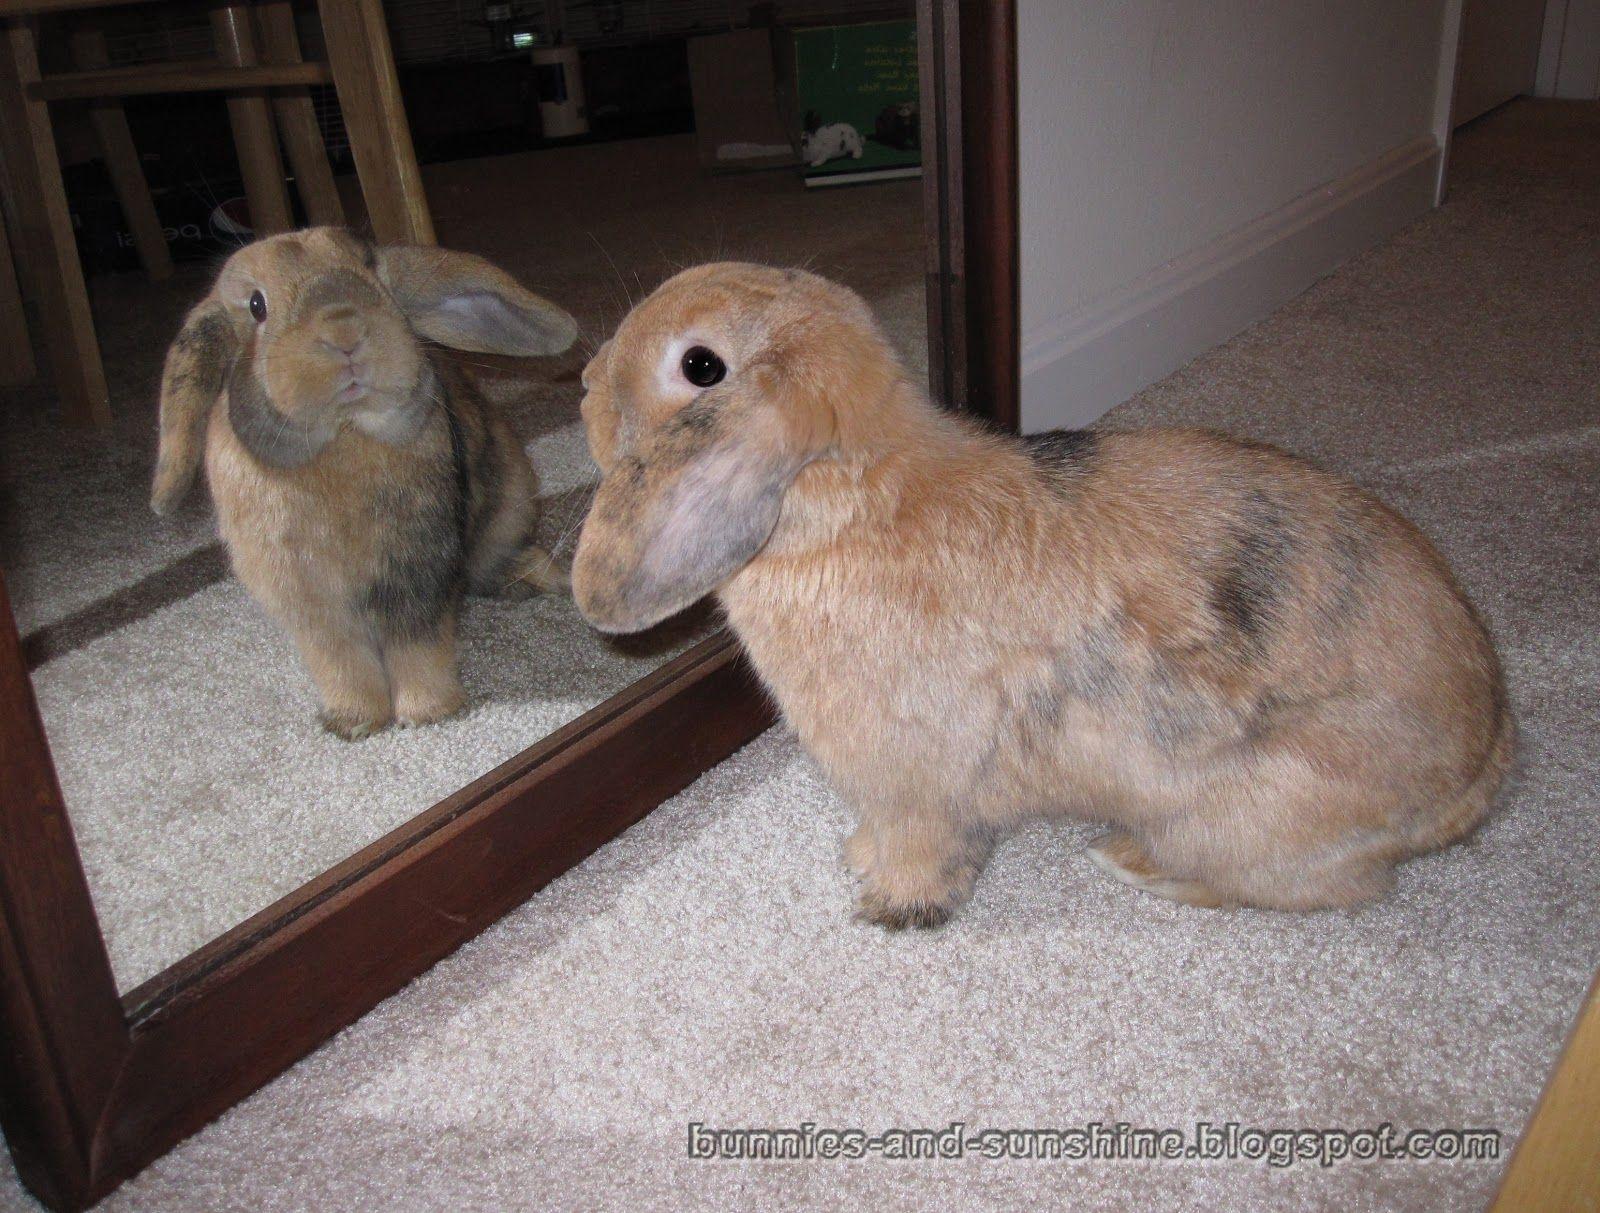 Obese Rabbit, Fat Rabbit, Overweight Rabbit, Hepatic Lipidosis